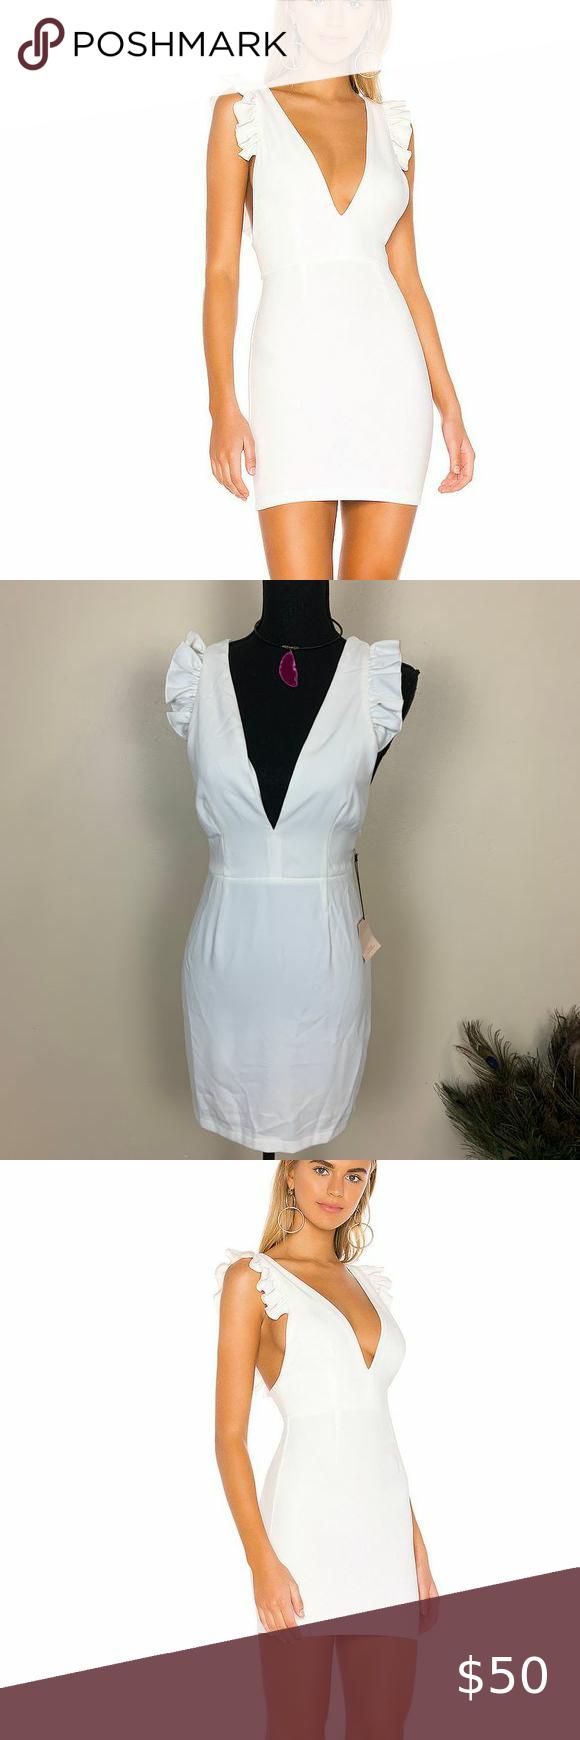 Superdown Keely Frill Mini Dress In White Revolve Mini Dress Fashion Clothes Women Fashion [ 1450 x 960 Pixel ]